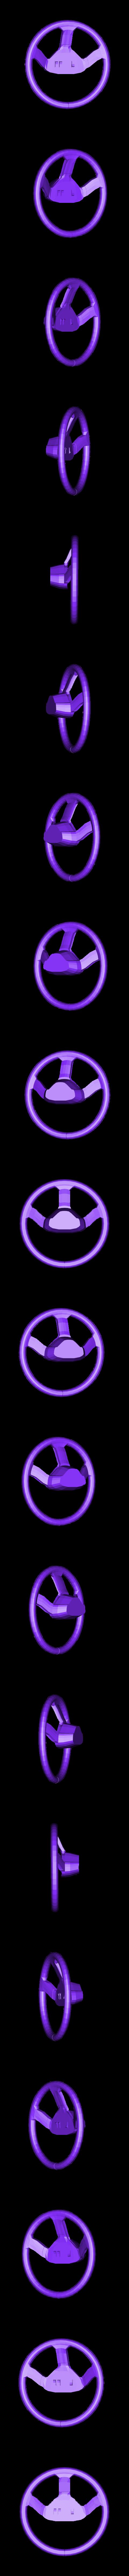 steering_wheel.stl Download free STL file DIY DeLorean Time Machine with lights!! • 3D printer model, OneIdMONstr